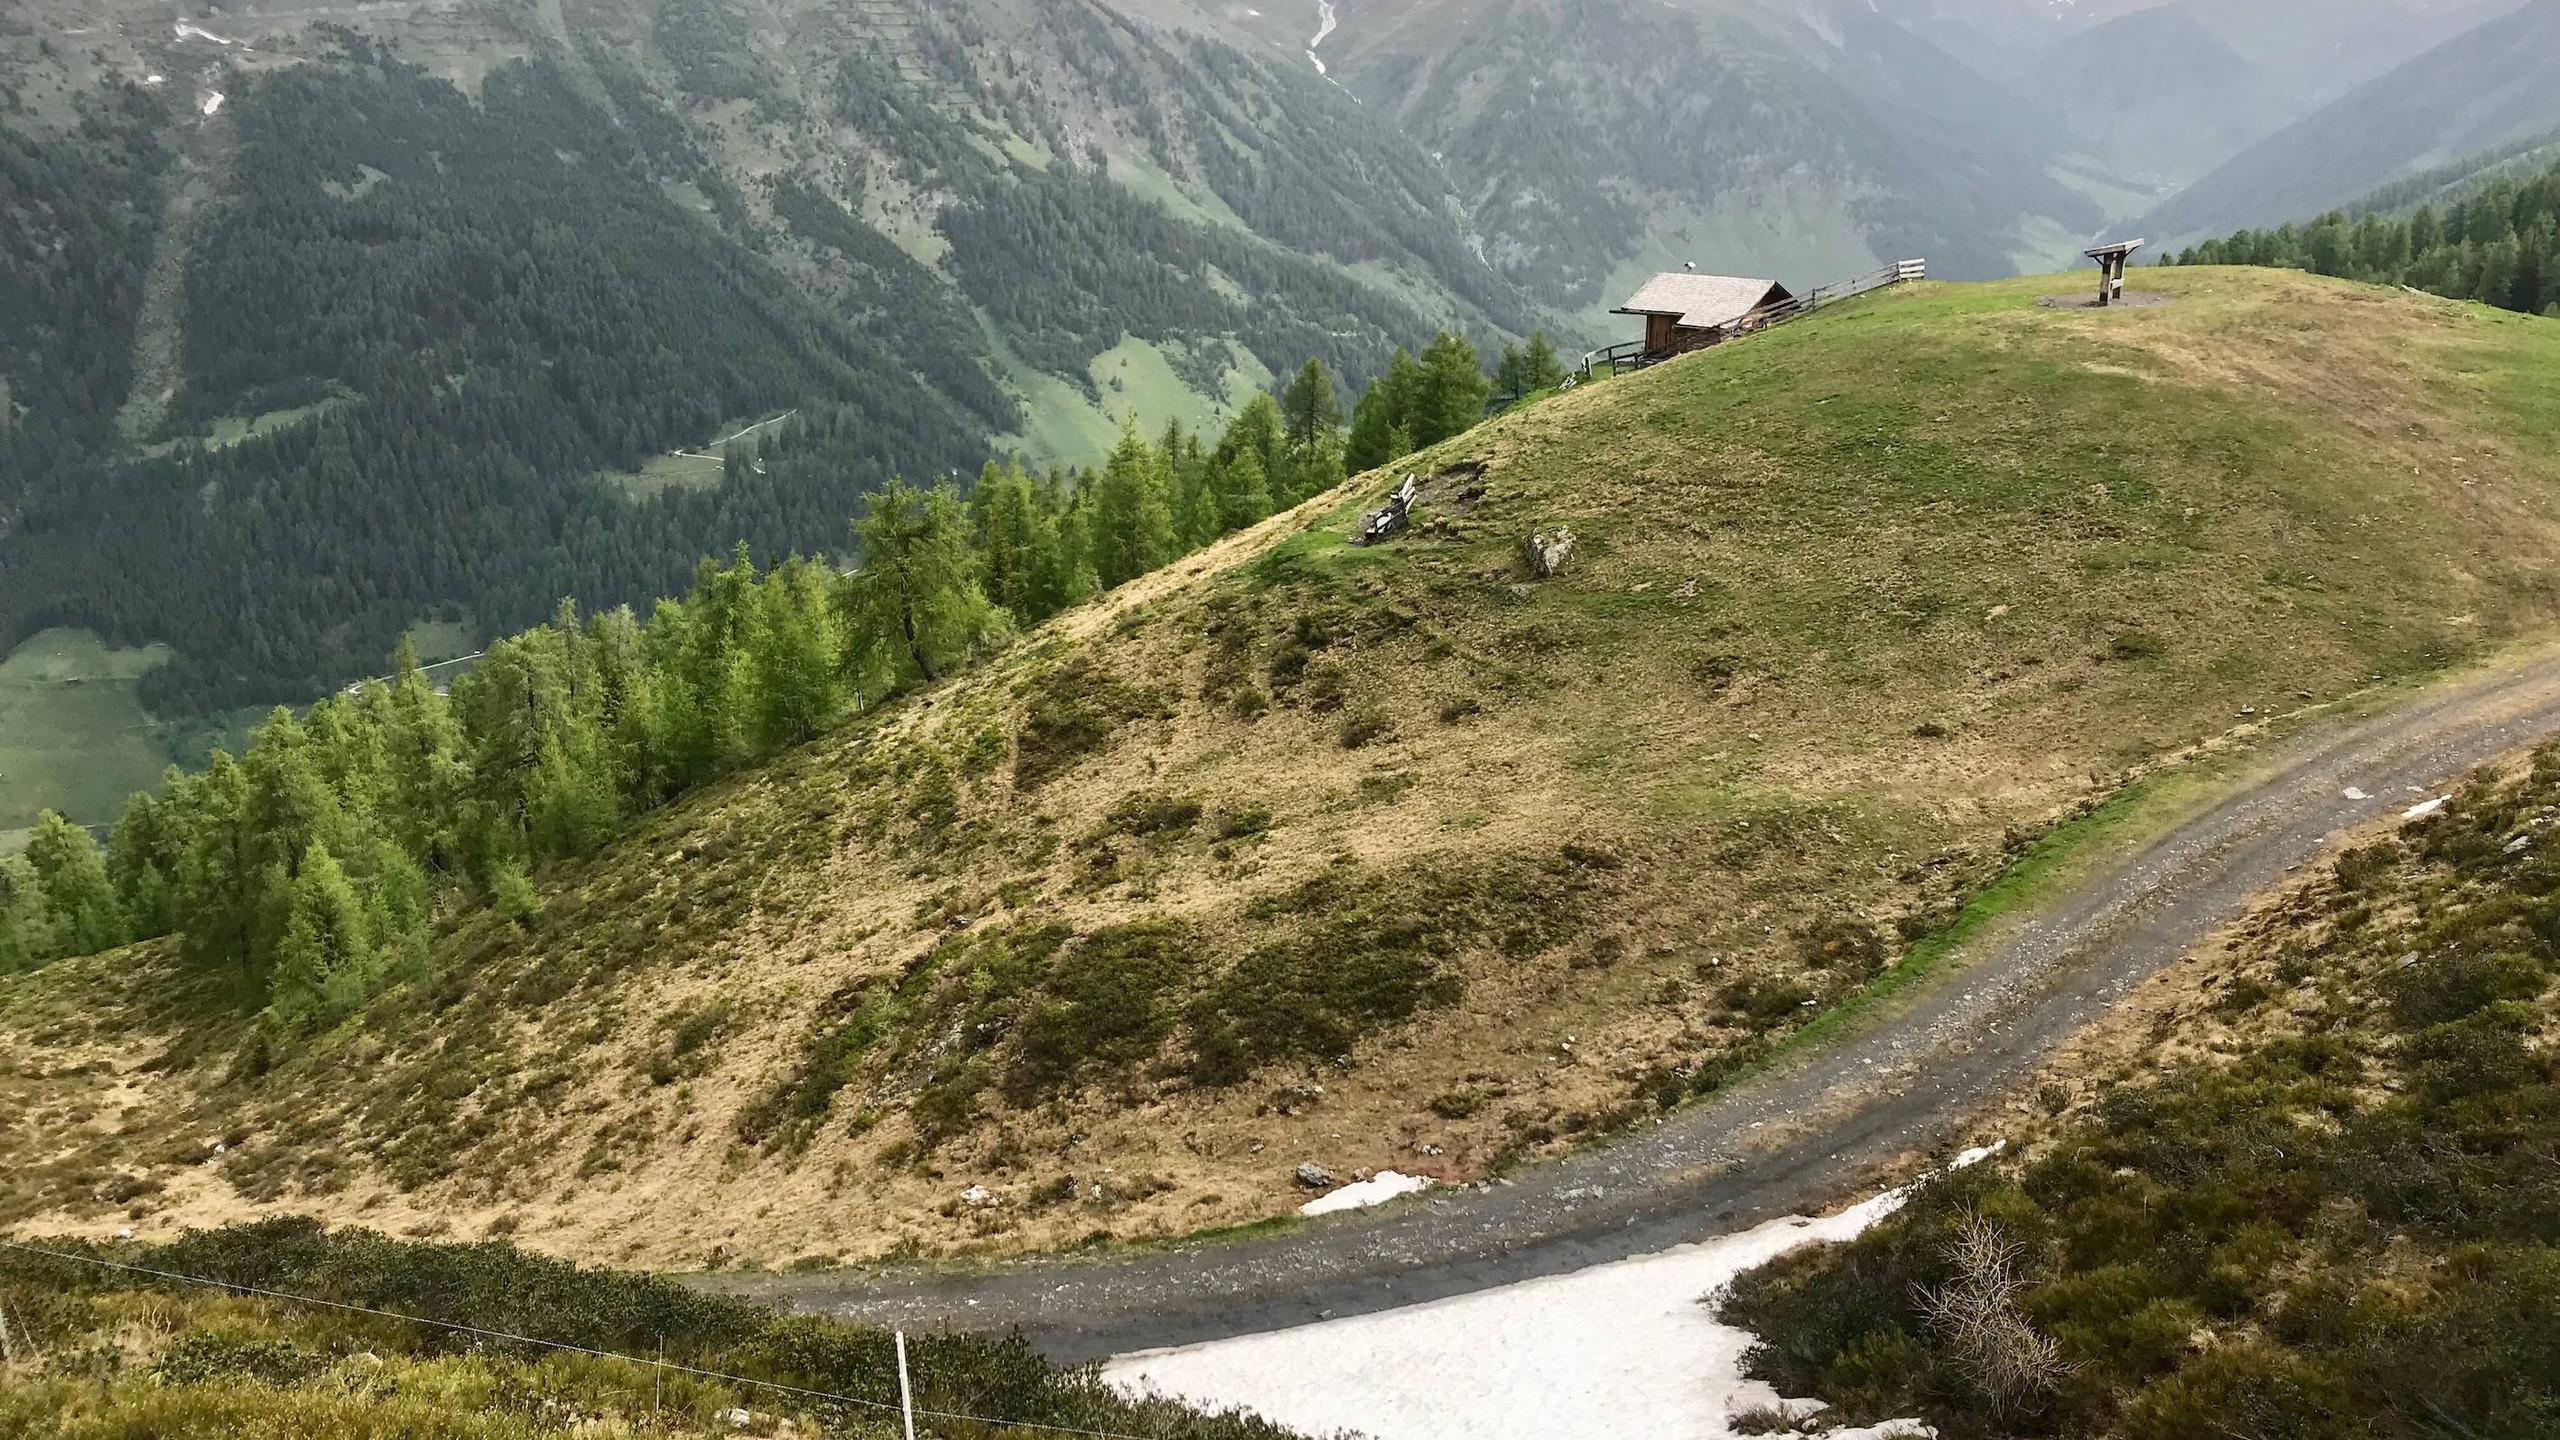 Ende des Forstweges zur Ottenspitze, Biketour Schmirntal